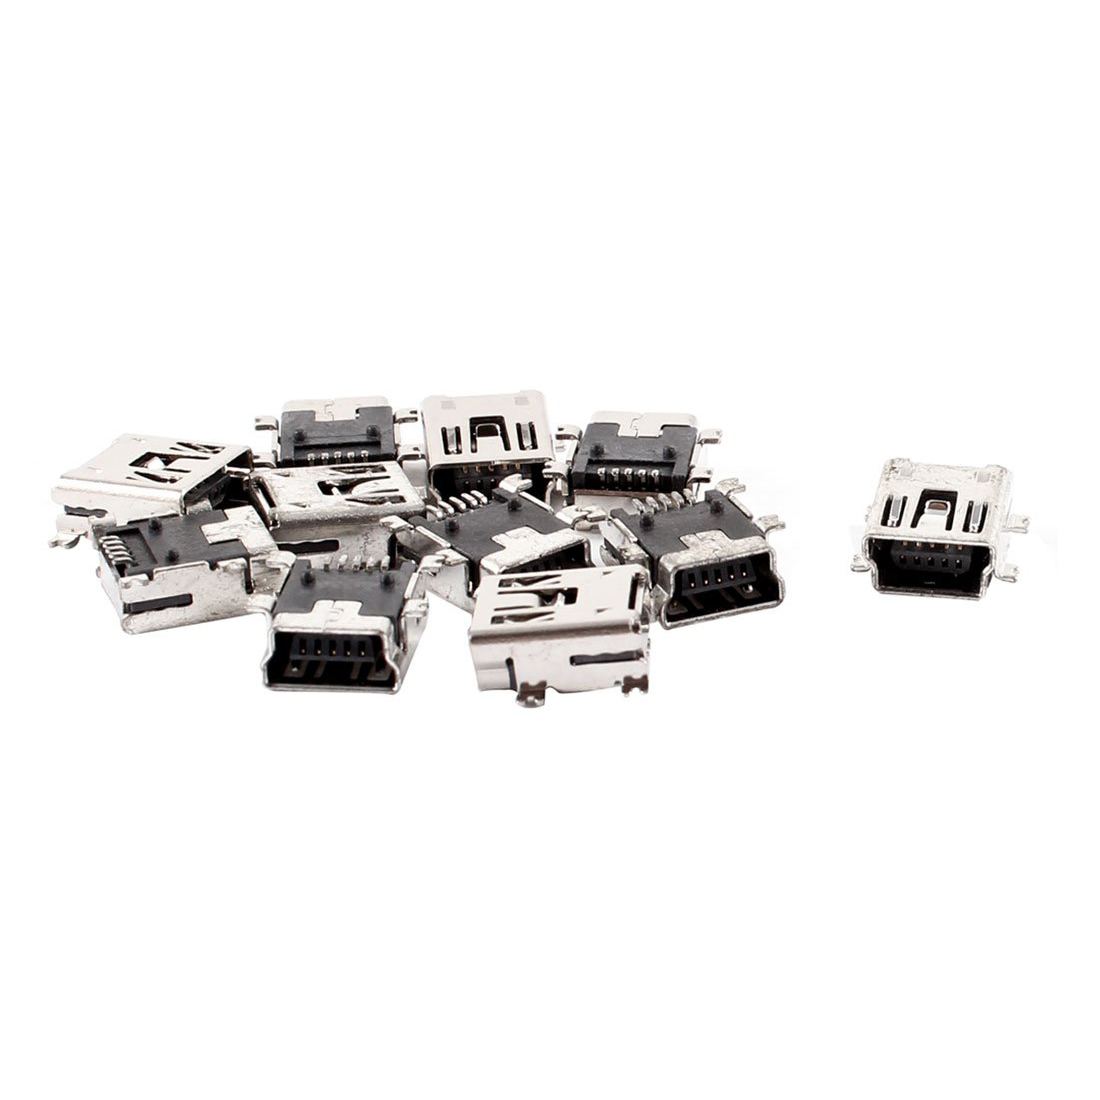 10 Pin Mini Usb Connector